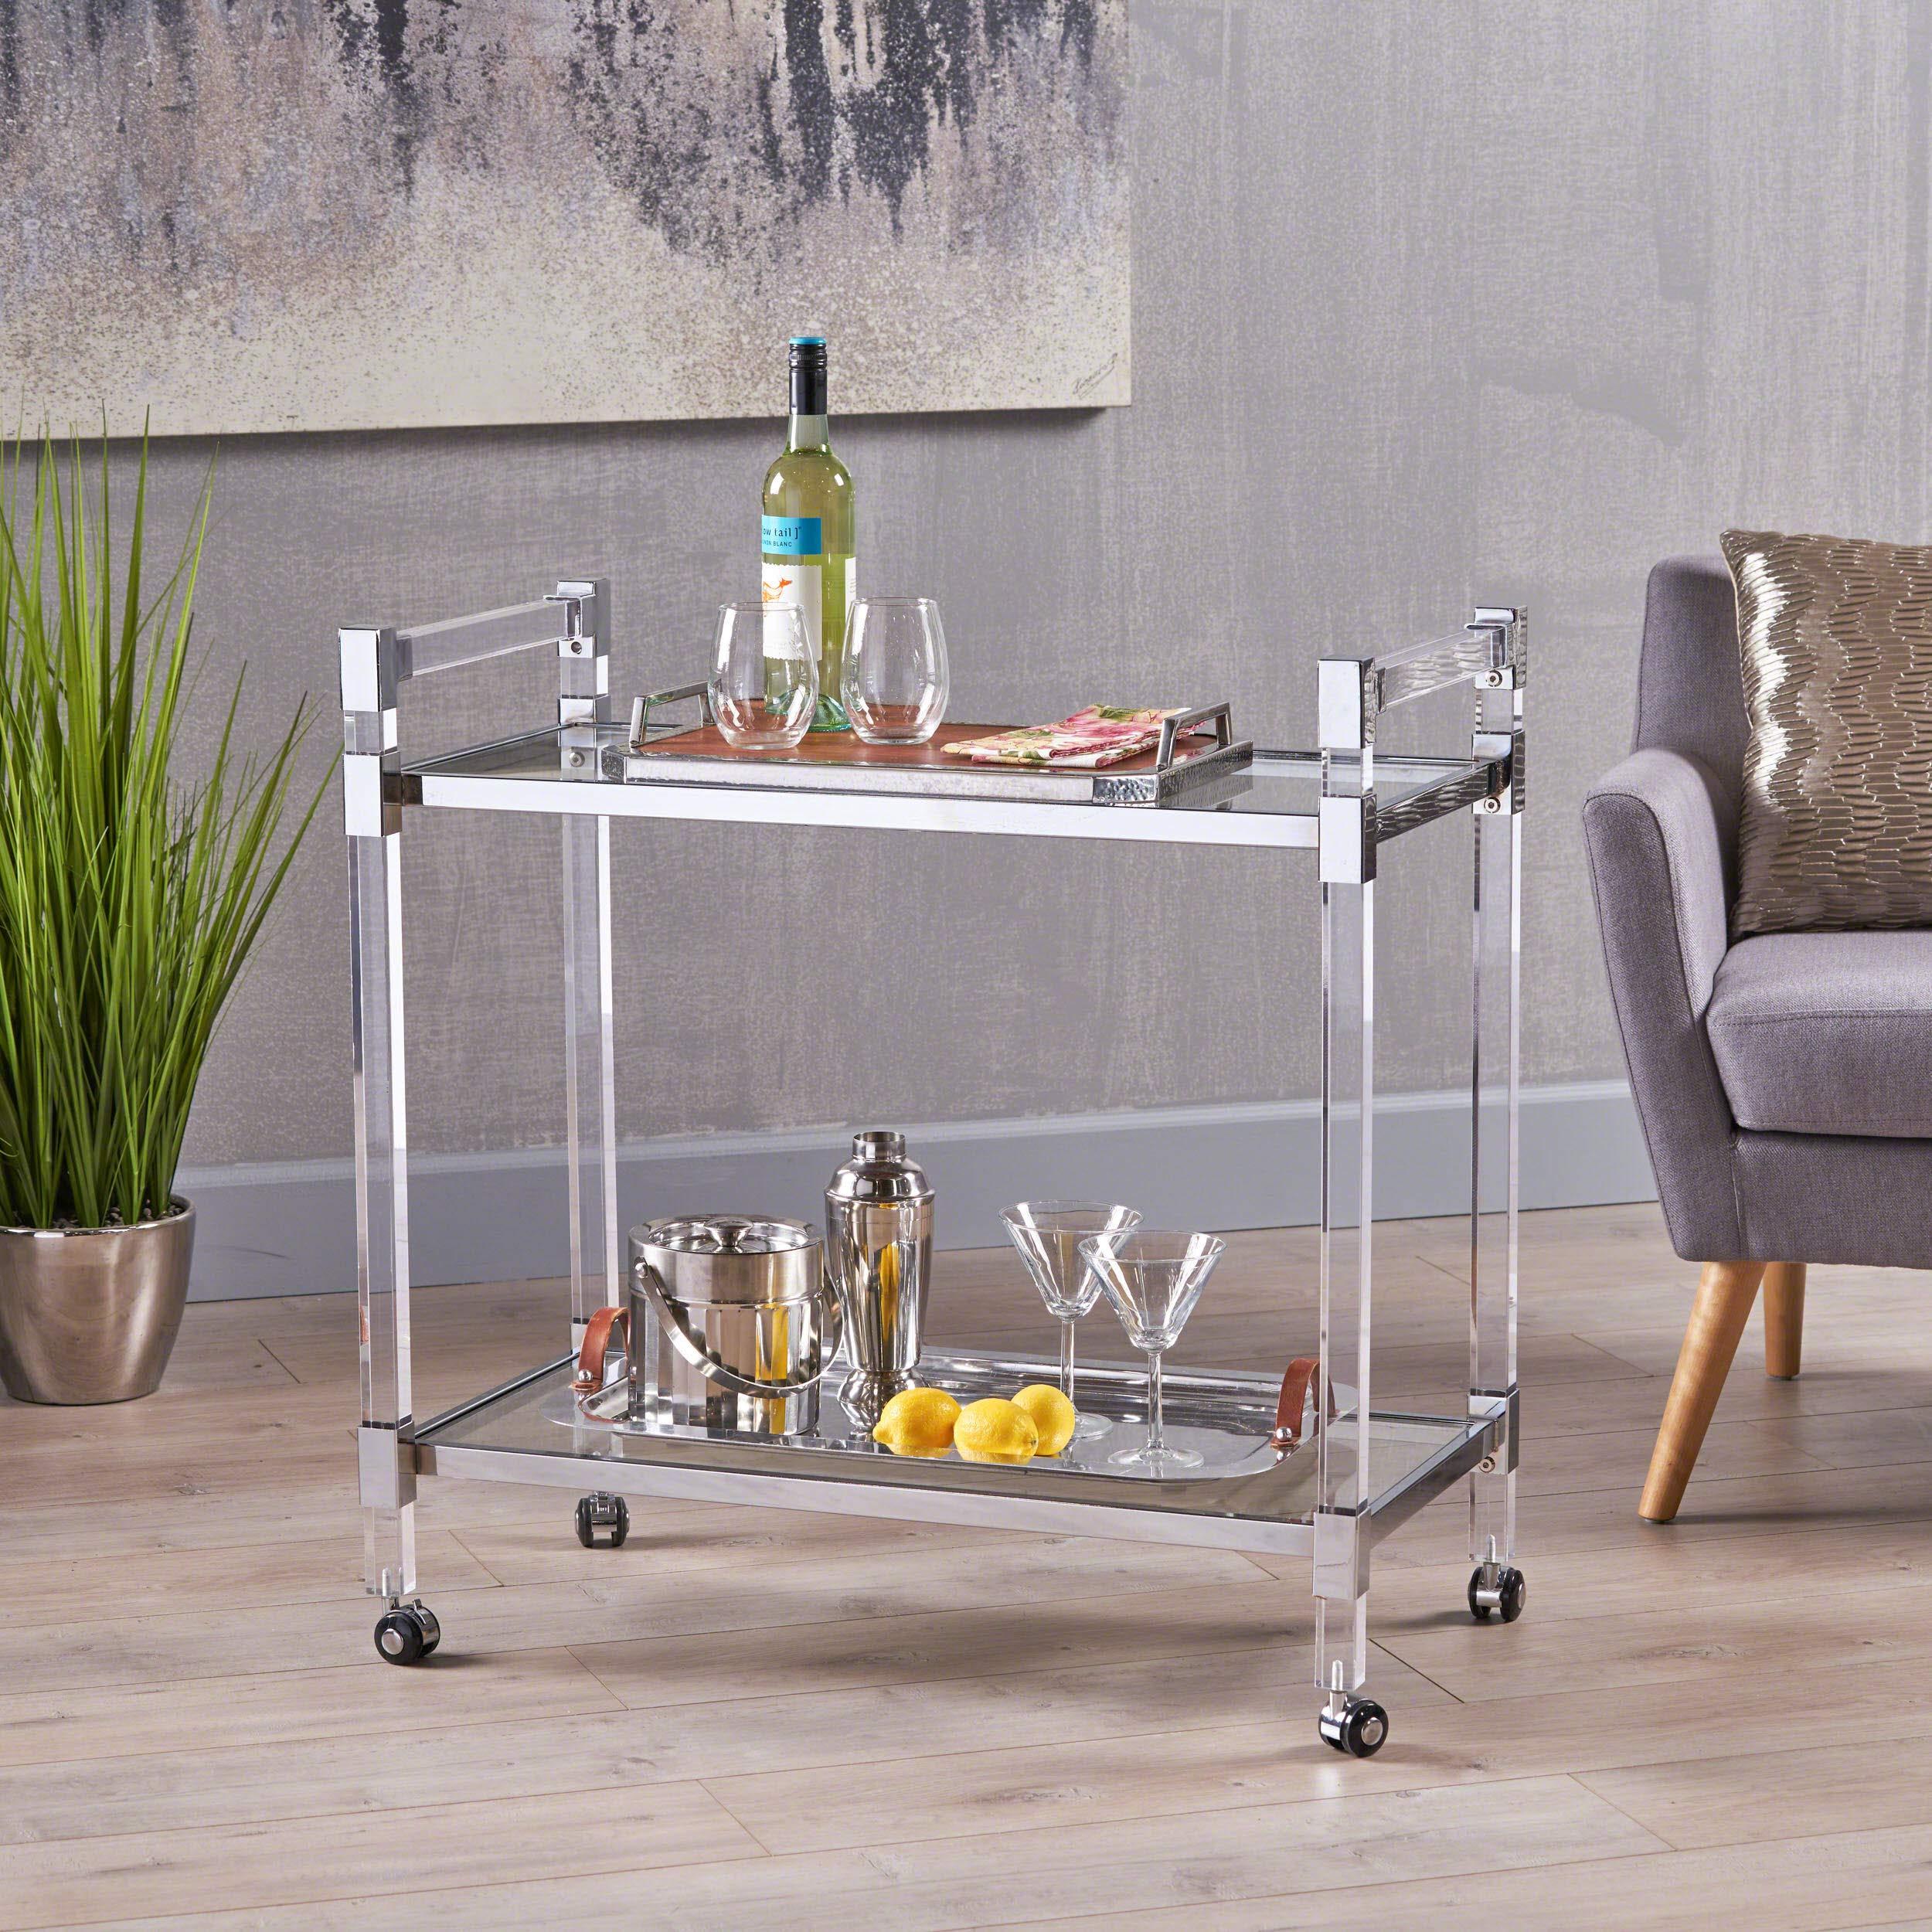 Christopher Knight Home 304602 Hilary Modern Glass Bar Trolley in Clear by Christopher Knight Home